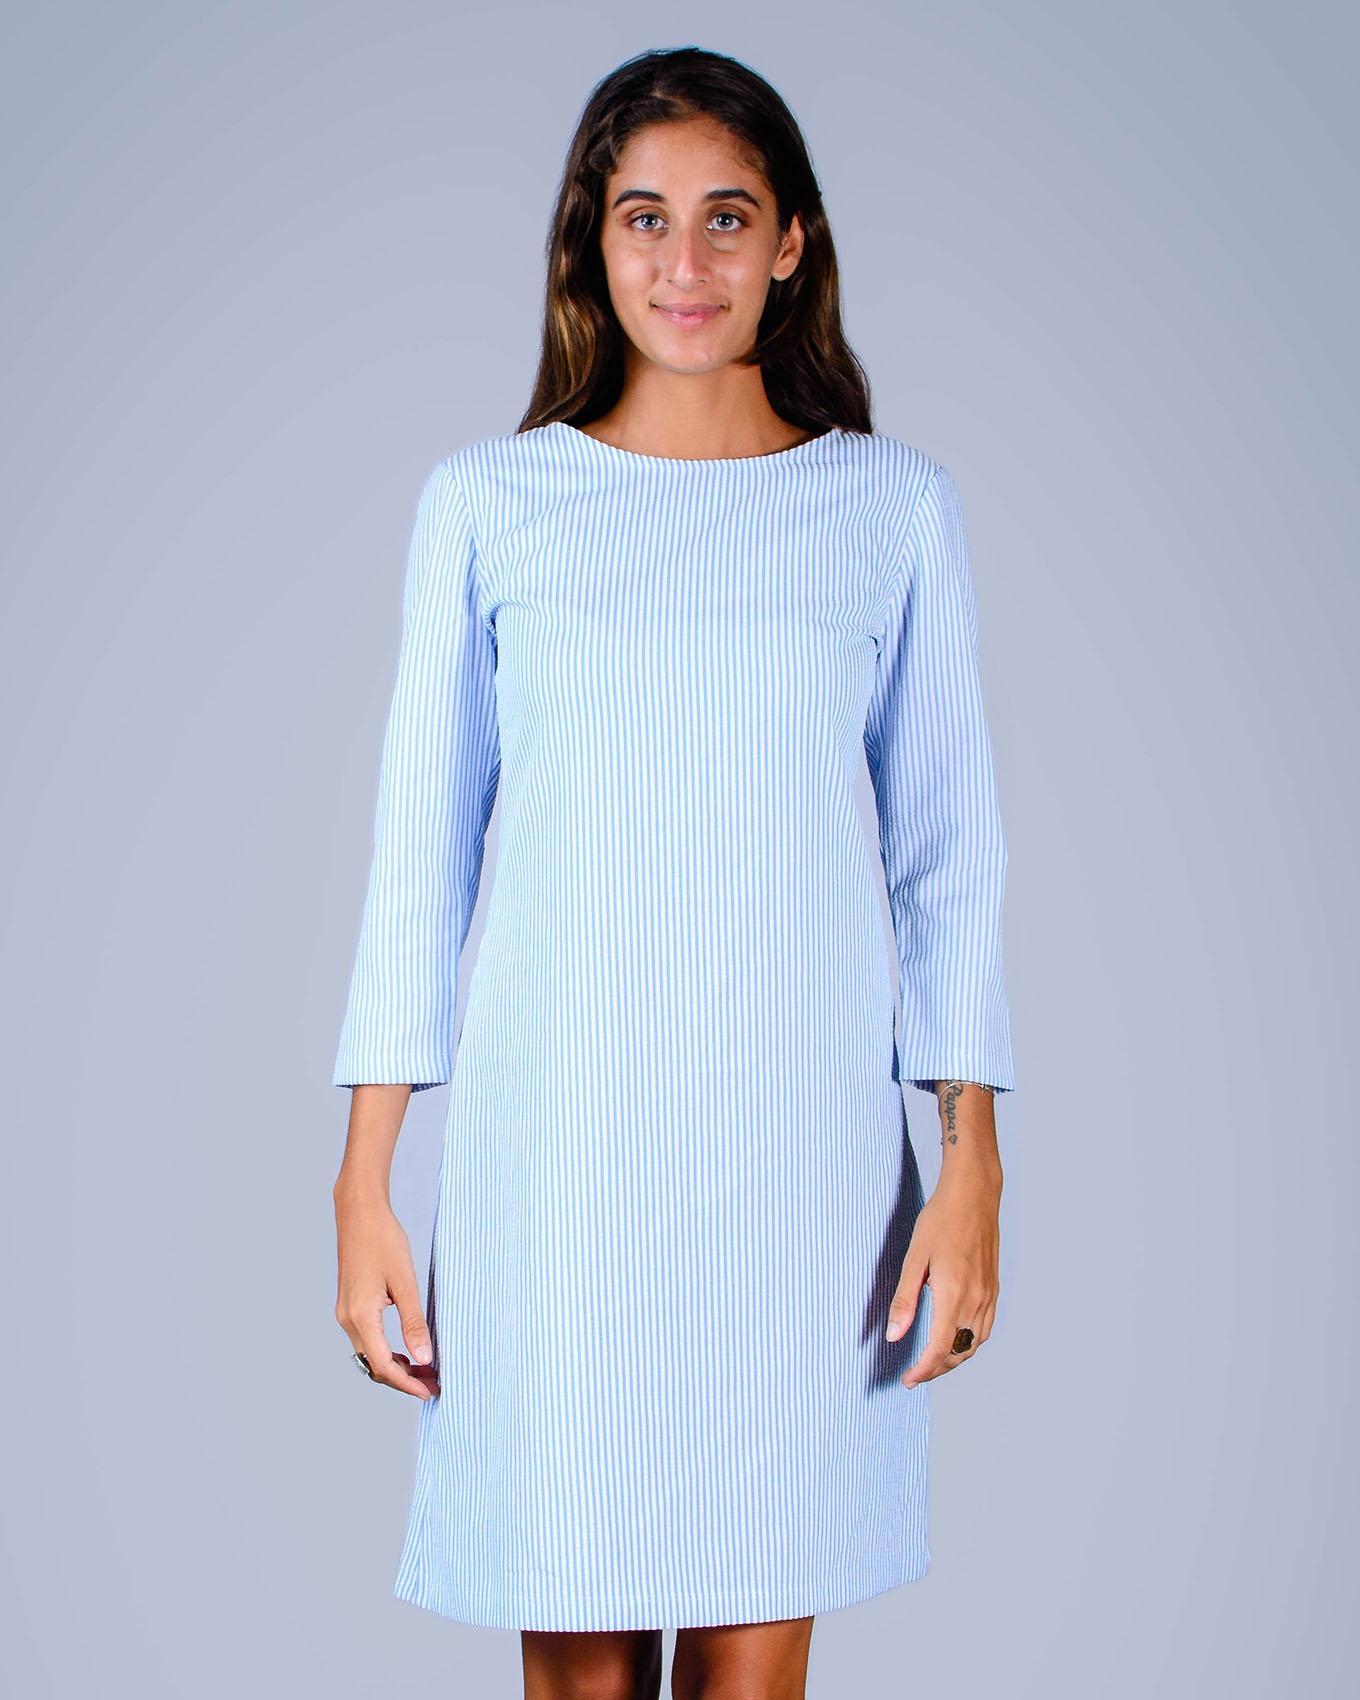 Party Frocks in Sri Lanka - Womens Party Dresses in Sri Lanka 513afeaf3ce6